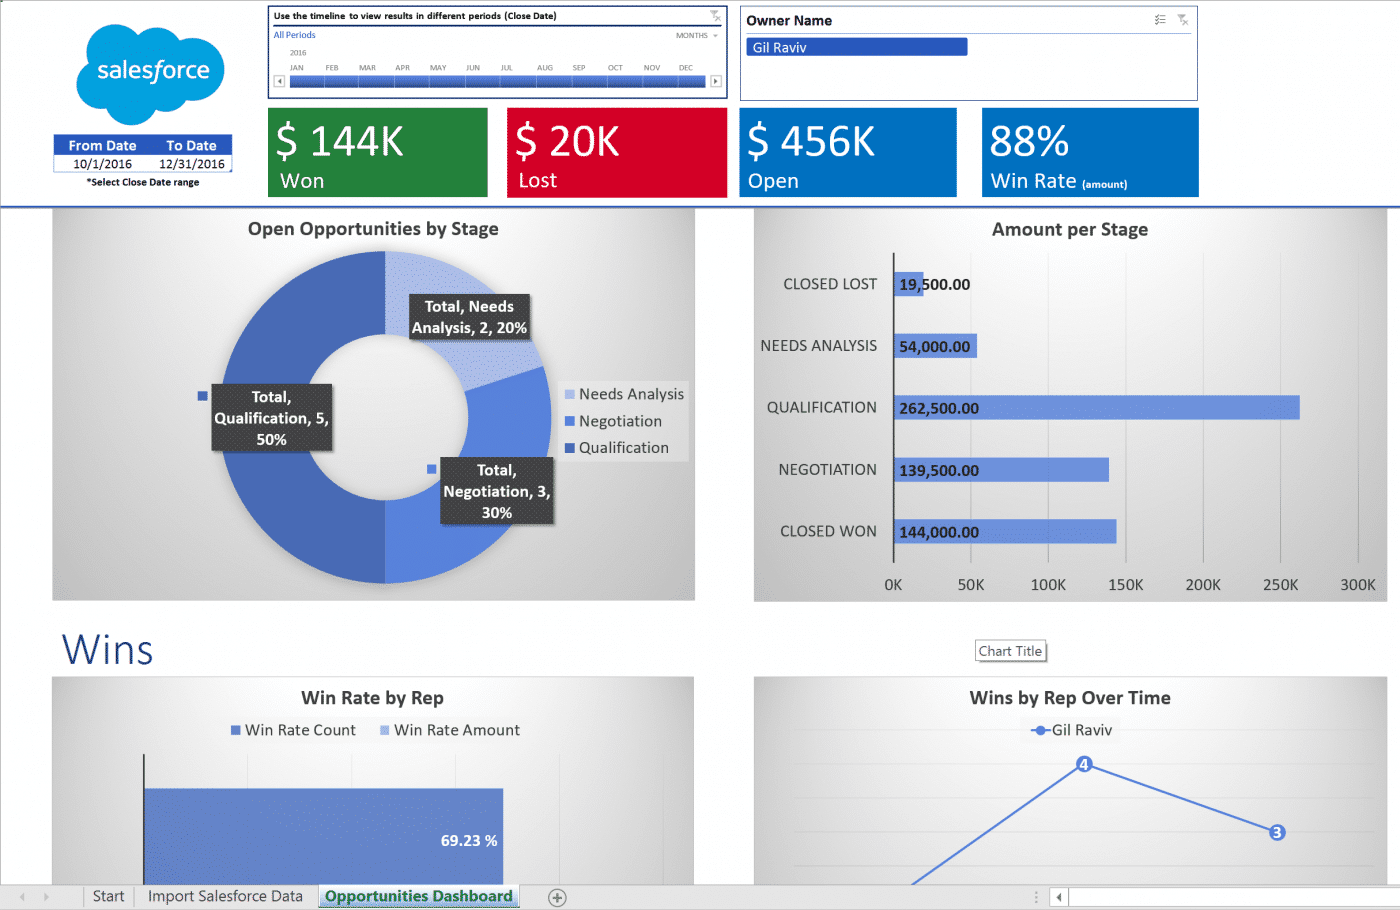 Salesforce: Analyze Salesforce Opportunities In Excel